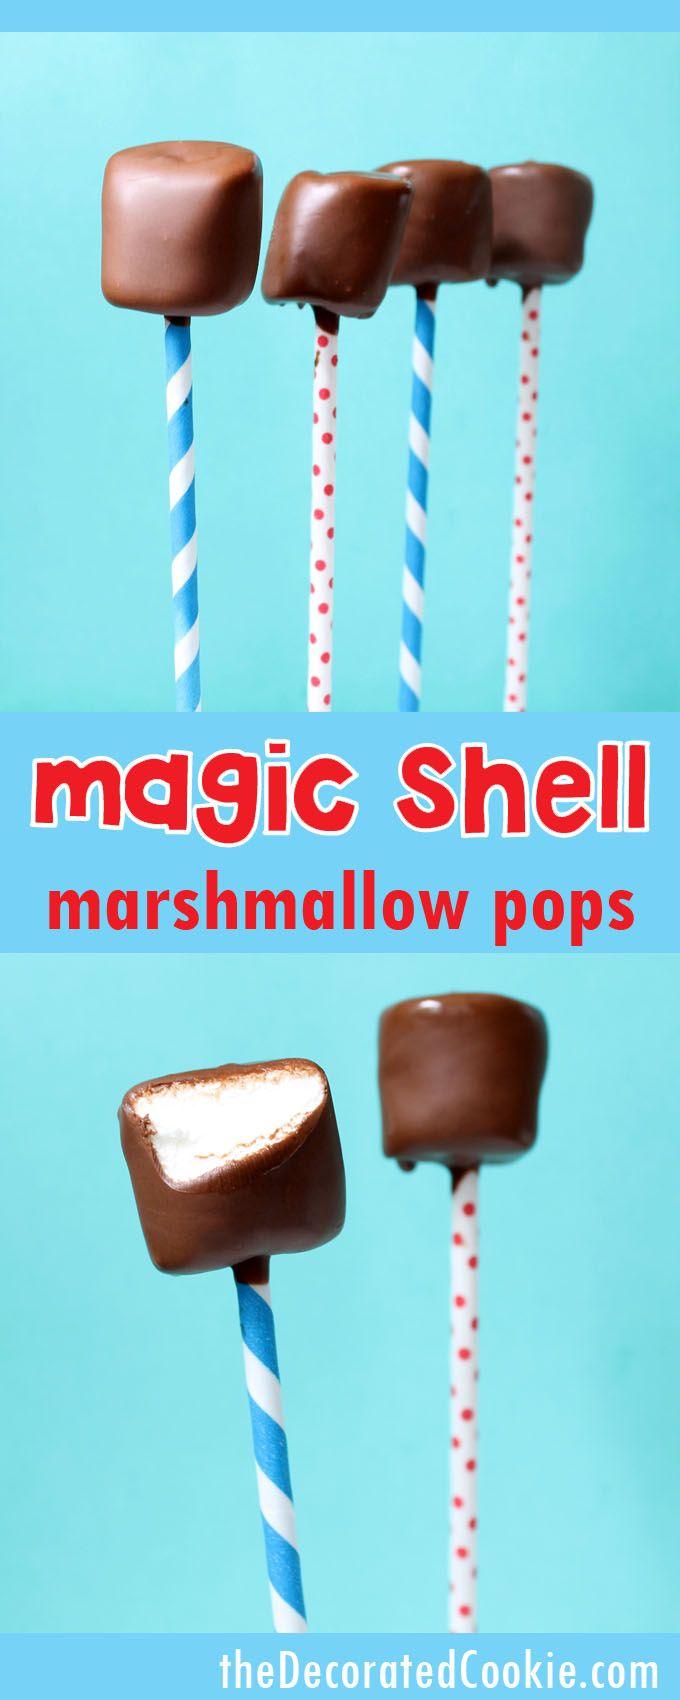 magic shell marshmallow pops -- 2-ingredient homemade magic shell